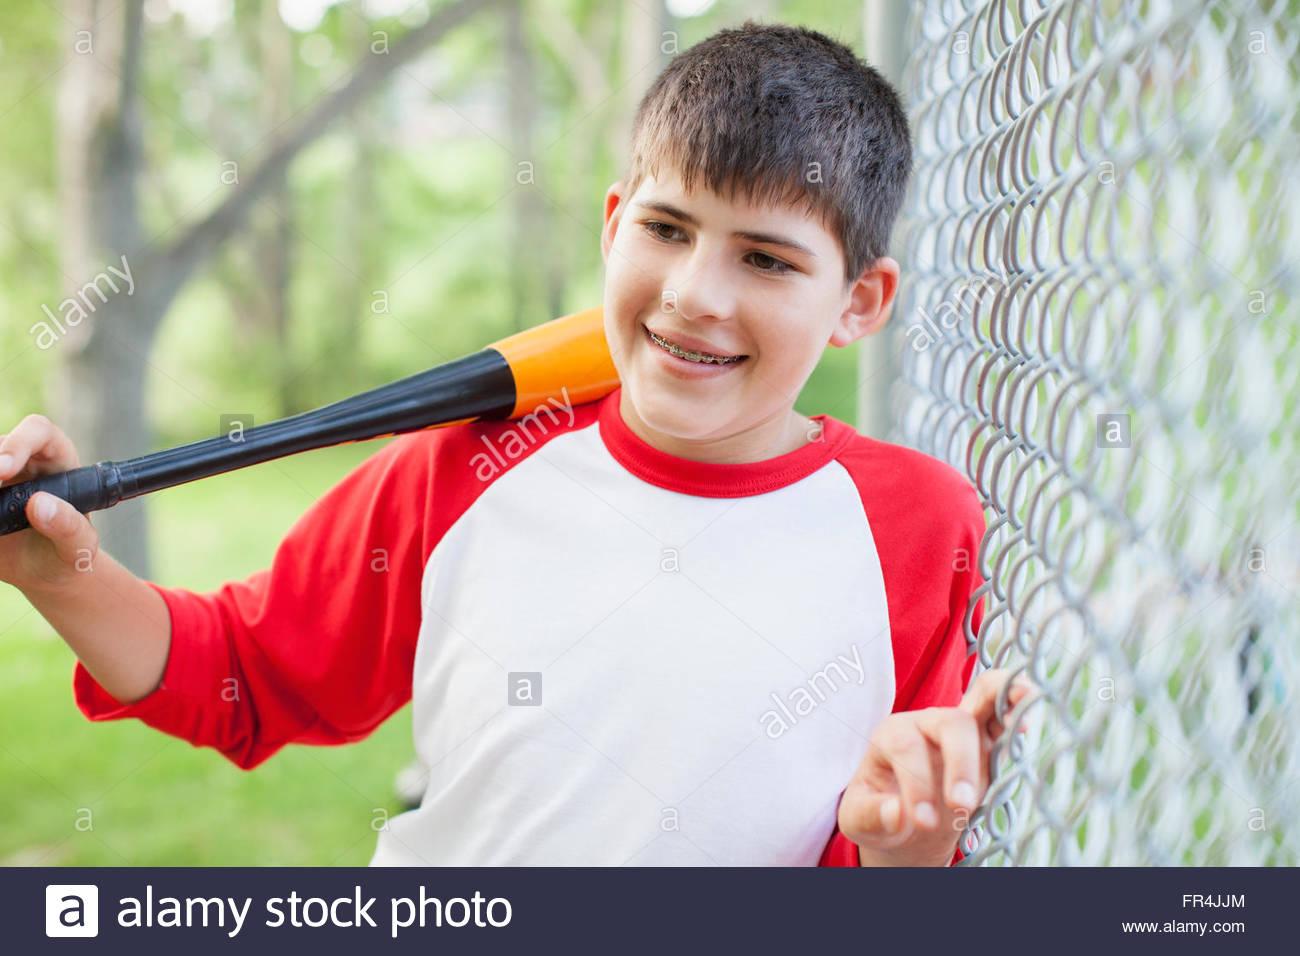 Young male baseball player with baseball bat. - Stock Image